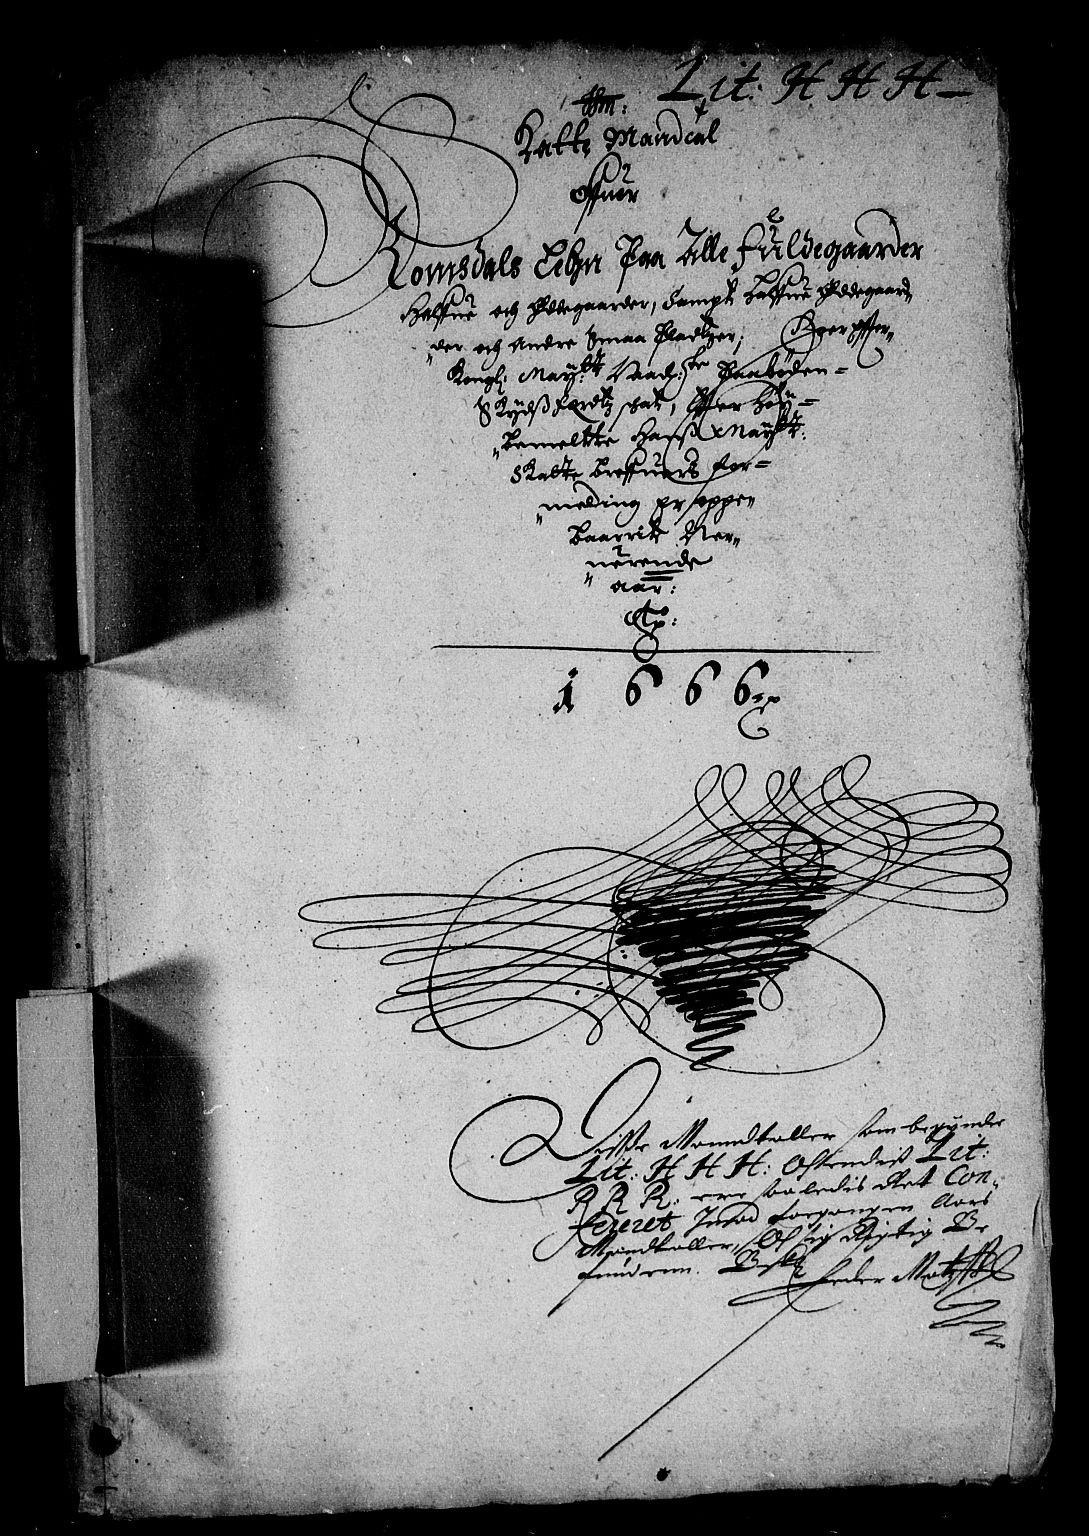 RA, Rentekammeret inntil 1814, Reviderte regnskaper, Stiftamtstueregnskaper, Trondheim stiftamt og Nordland amt, R/Rd/L0019: Trondheim stiftamt, 1665-1666